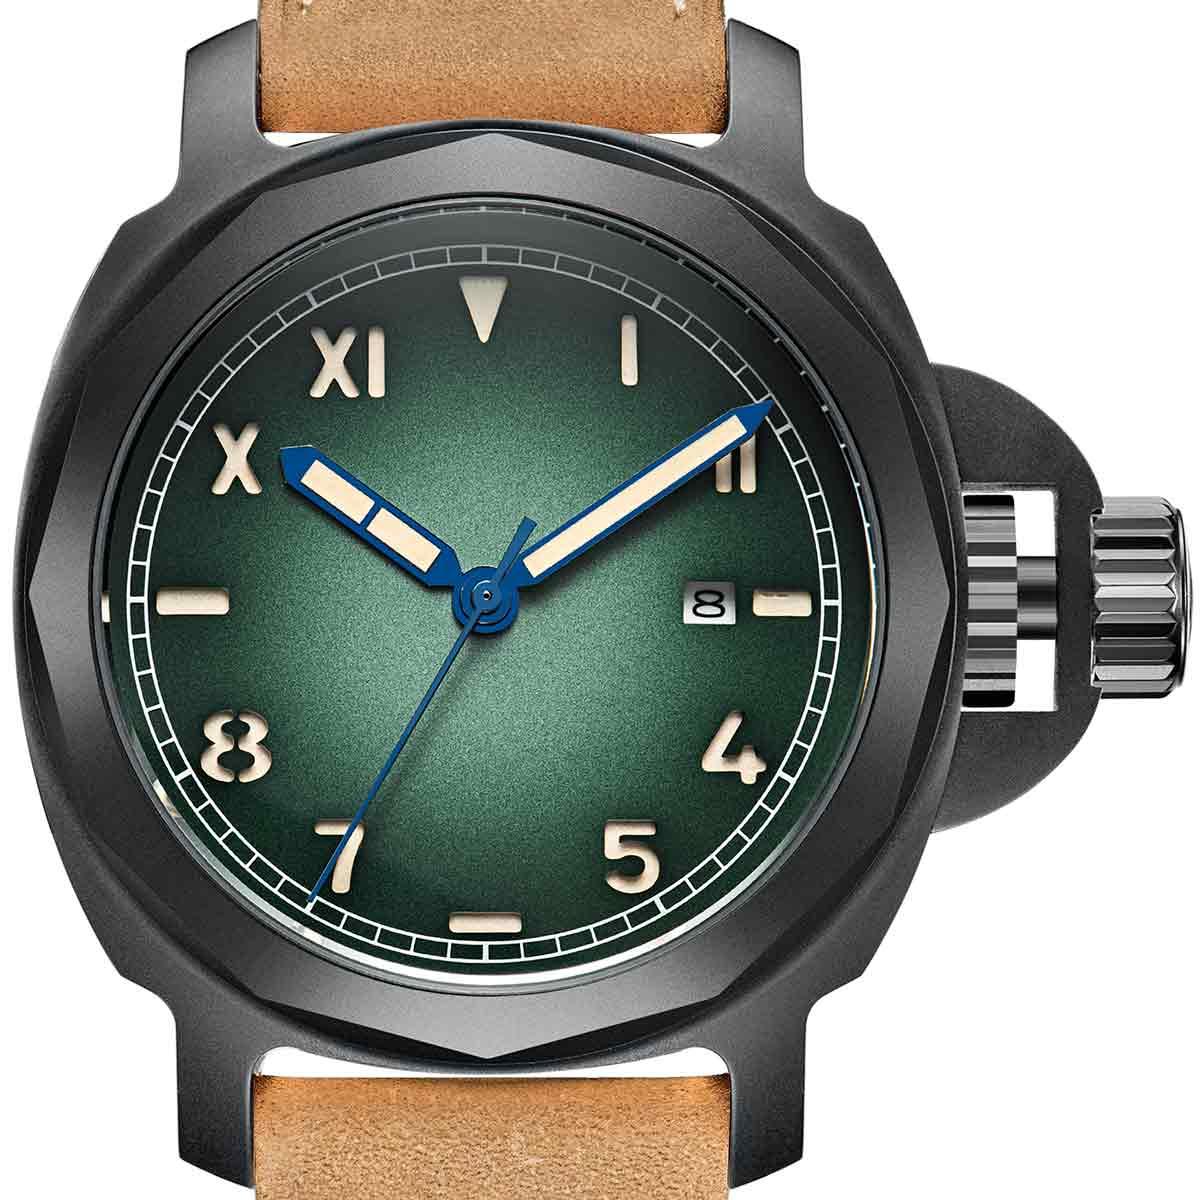 【NEW】PARNIS パーニス 自動巻き 腕時計 [PA6027-S3AL-BKGR] 並行輸入品 純正ケース メーカー保証12ヶ月